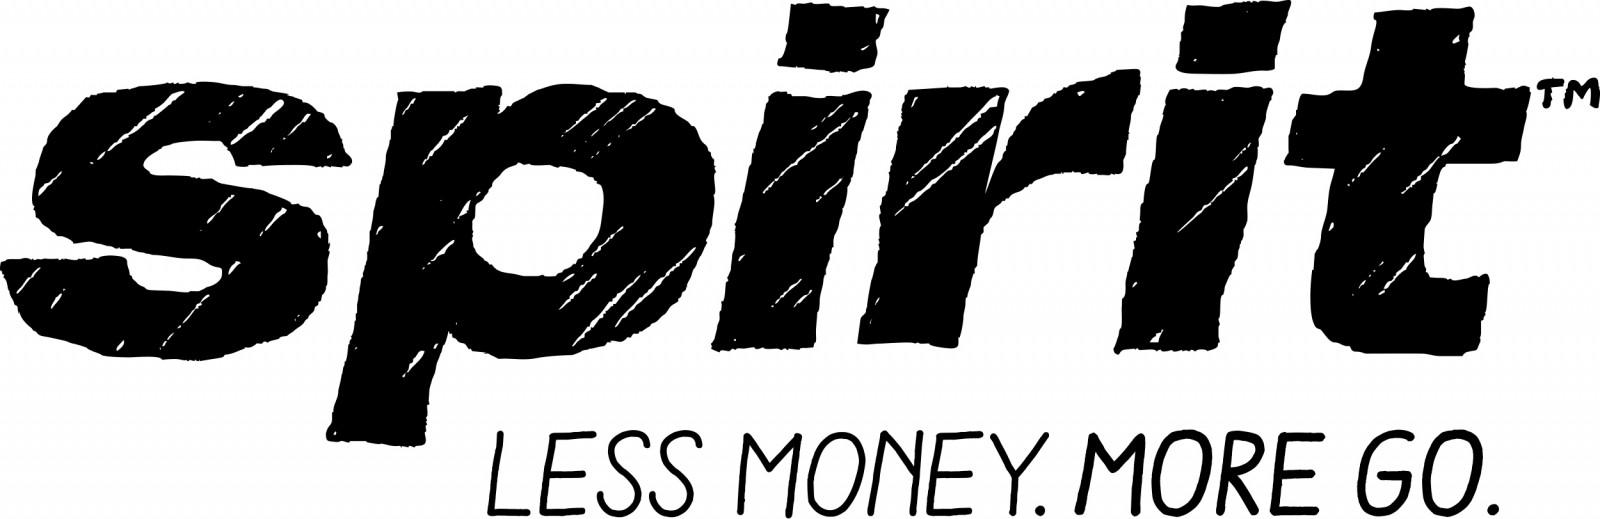 Spirit Airlines Logo